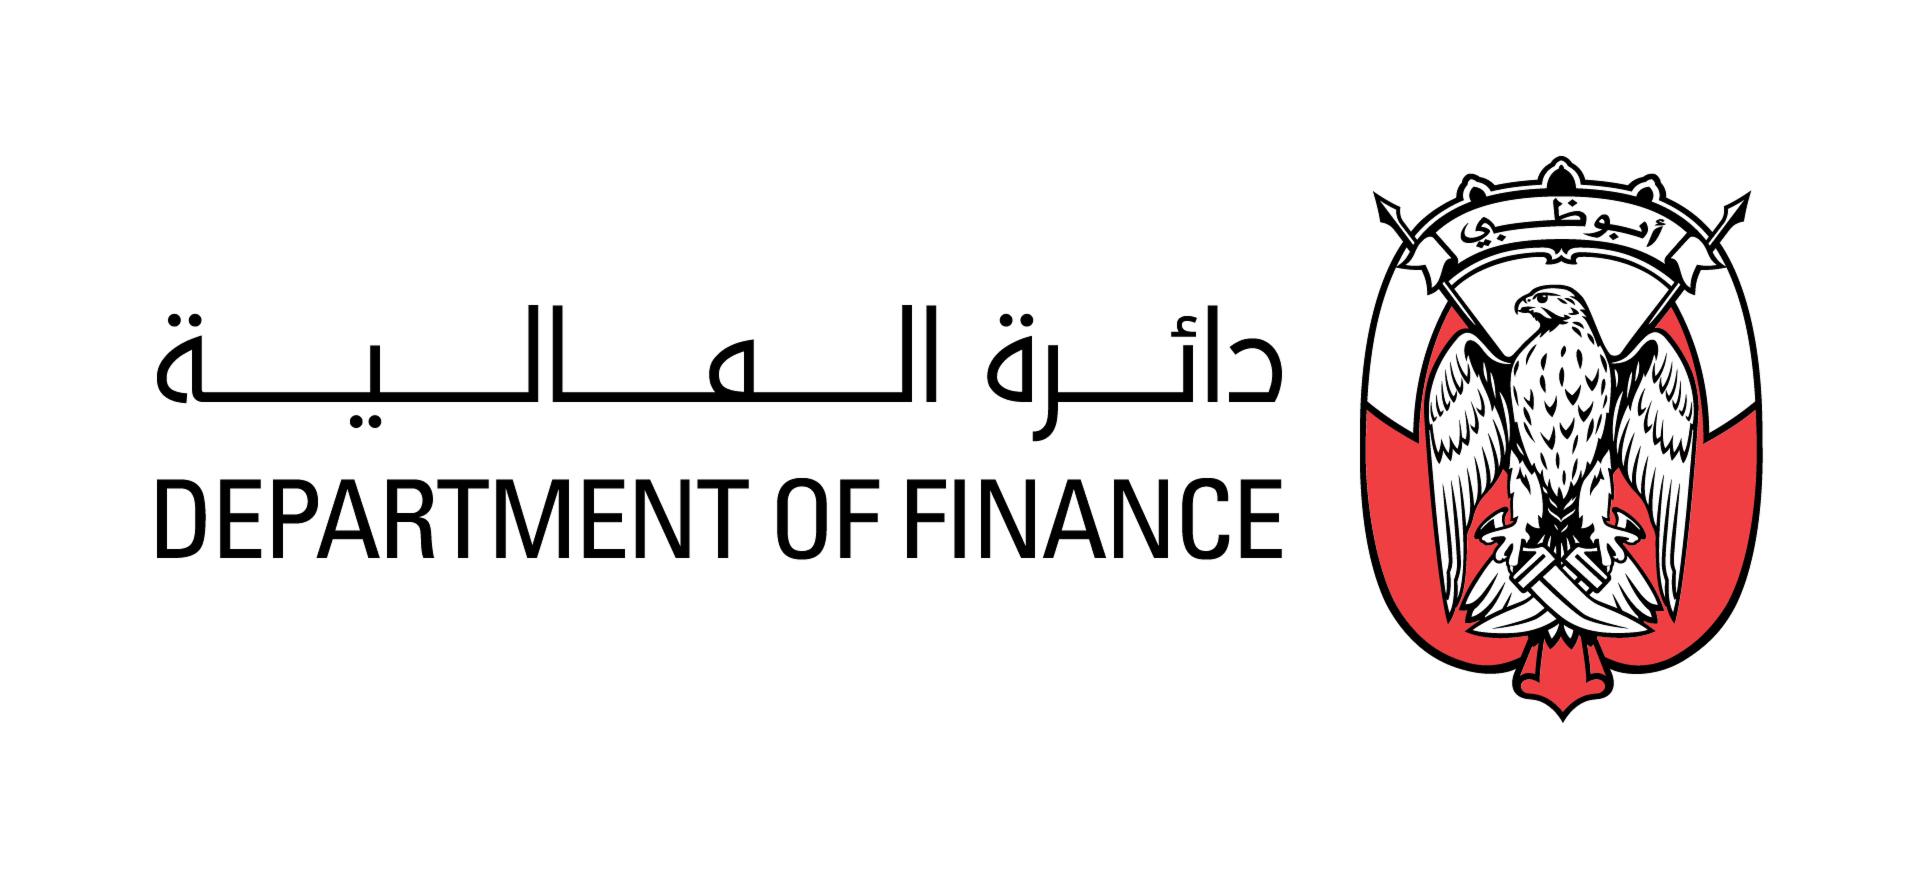 Sponsored by Dept of Finance